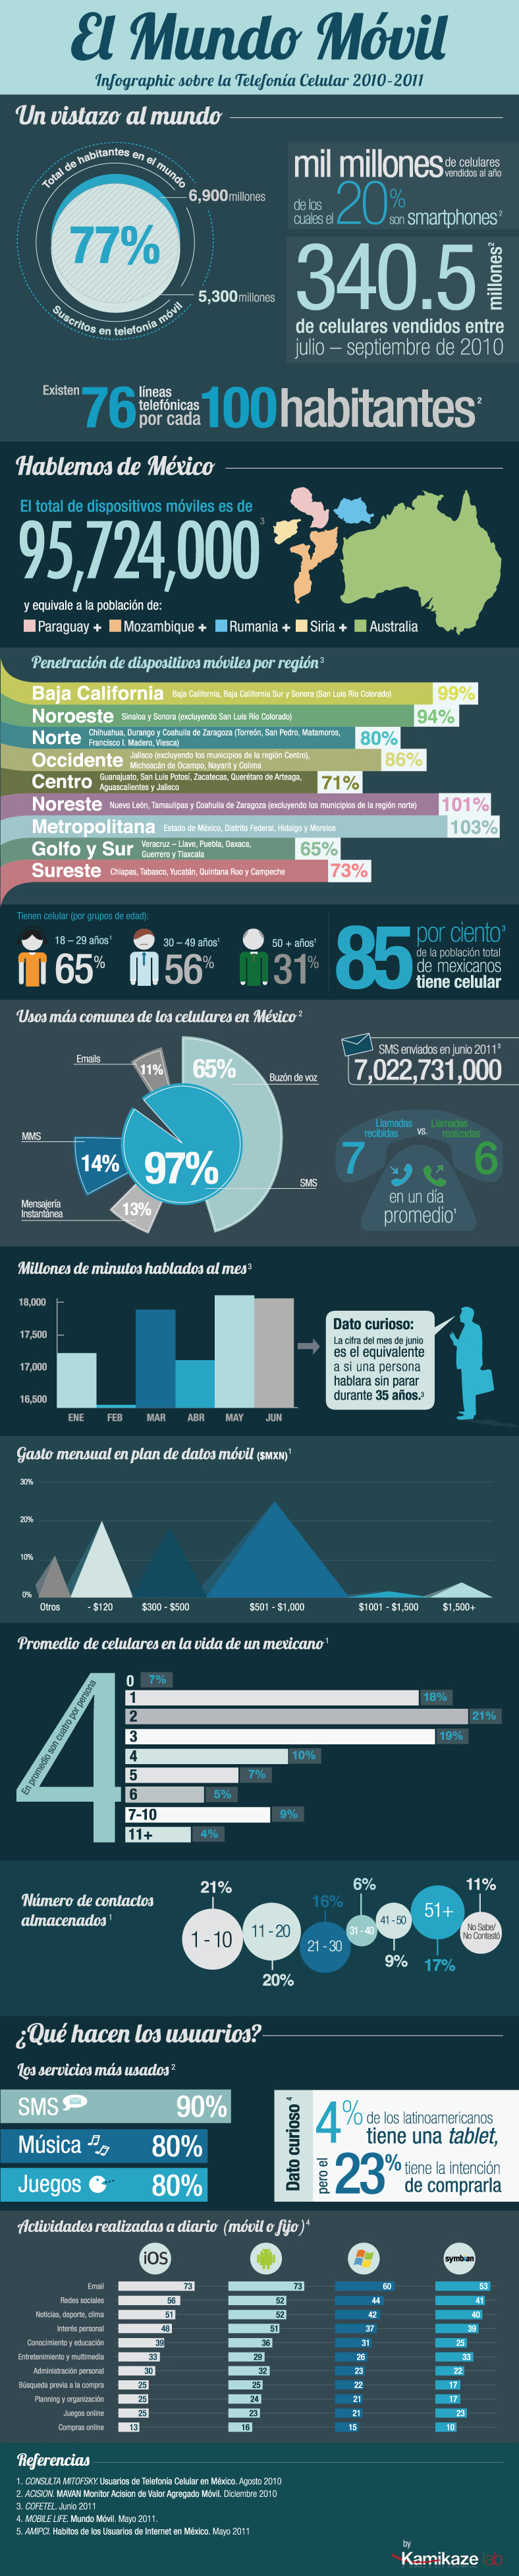 El Mundo Móvil- Infographic